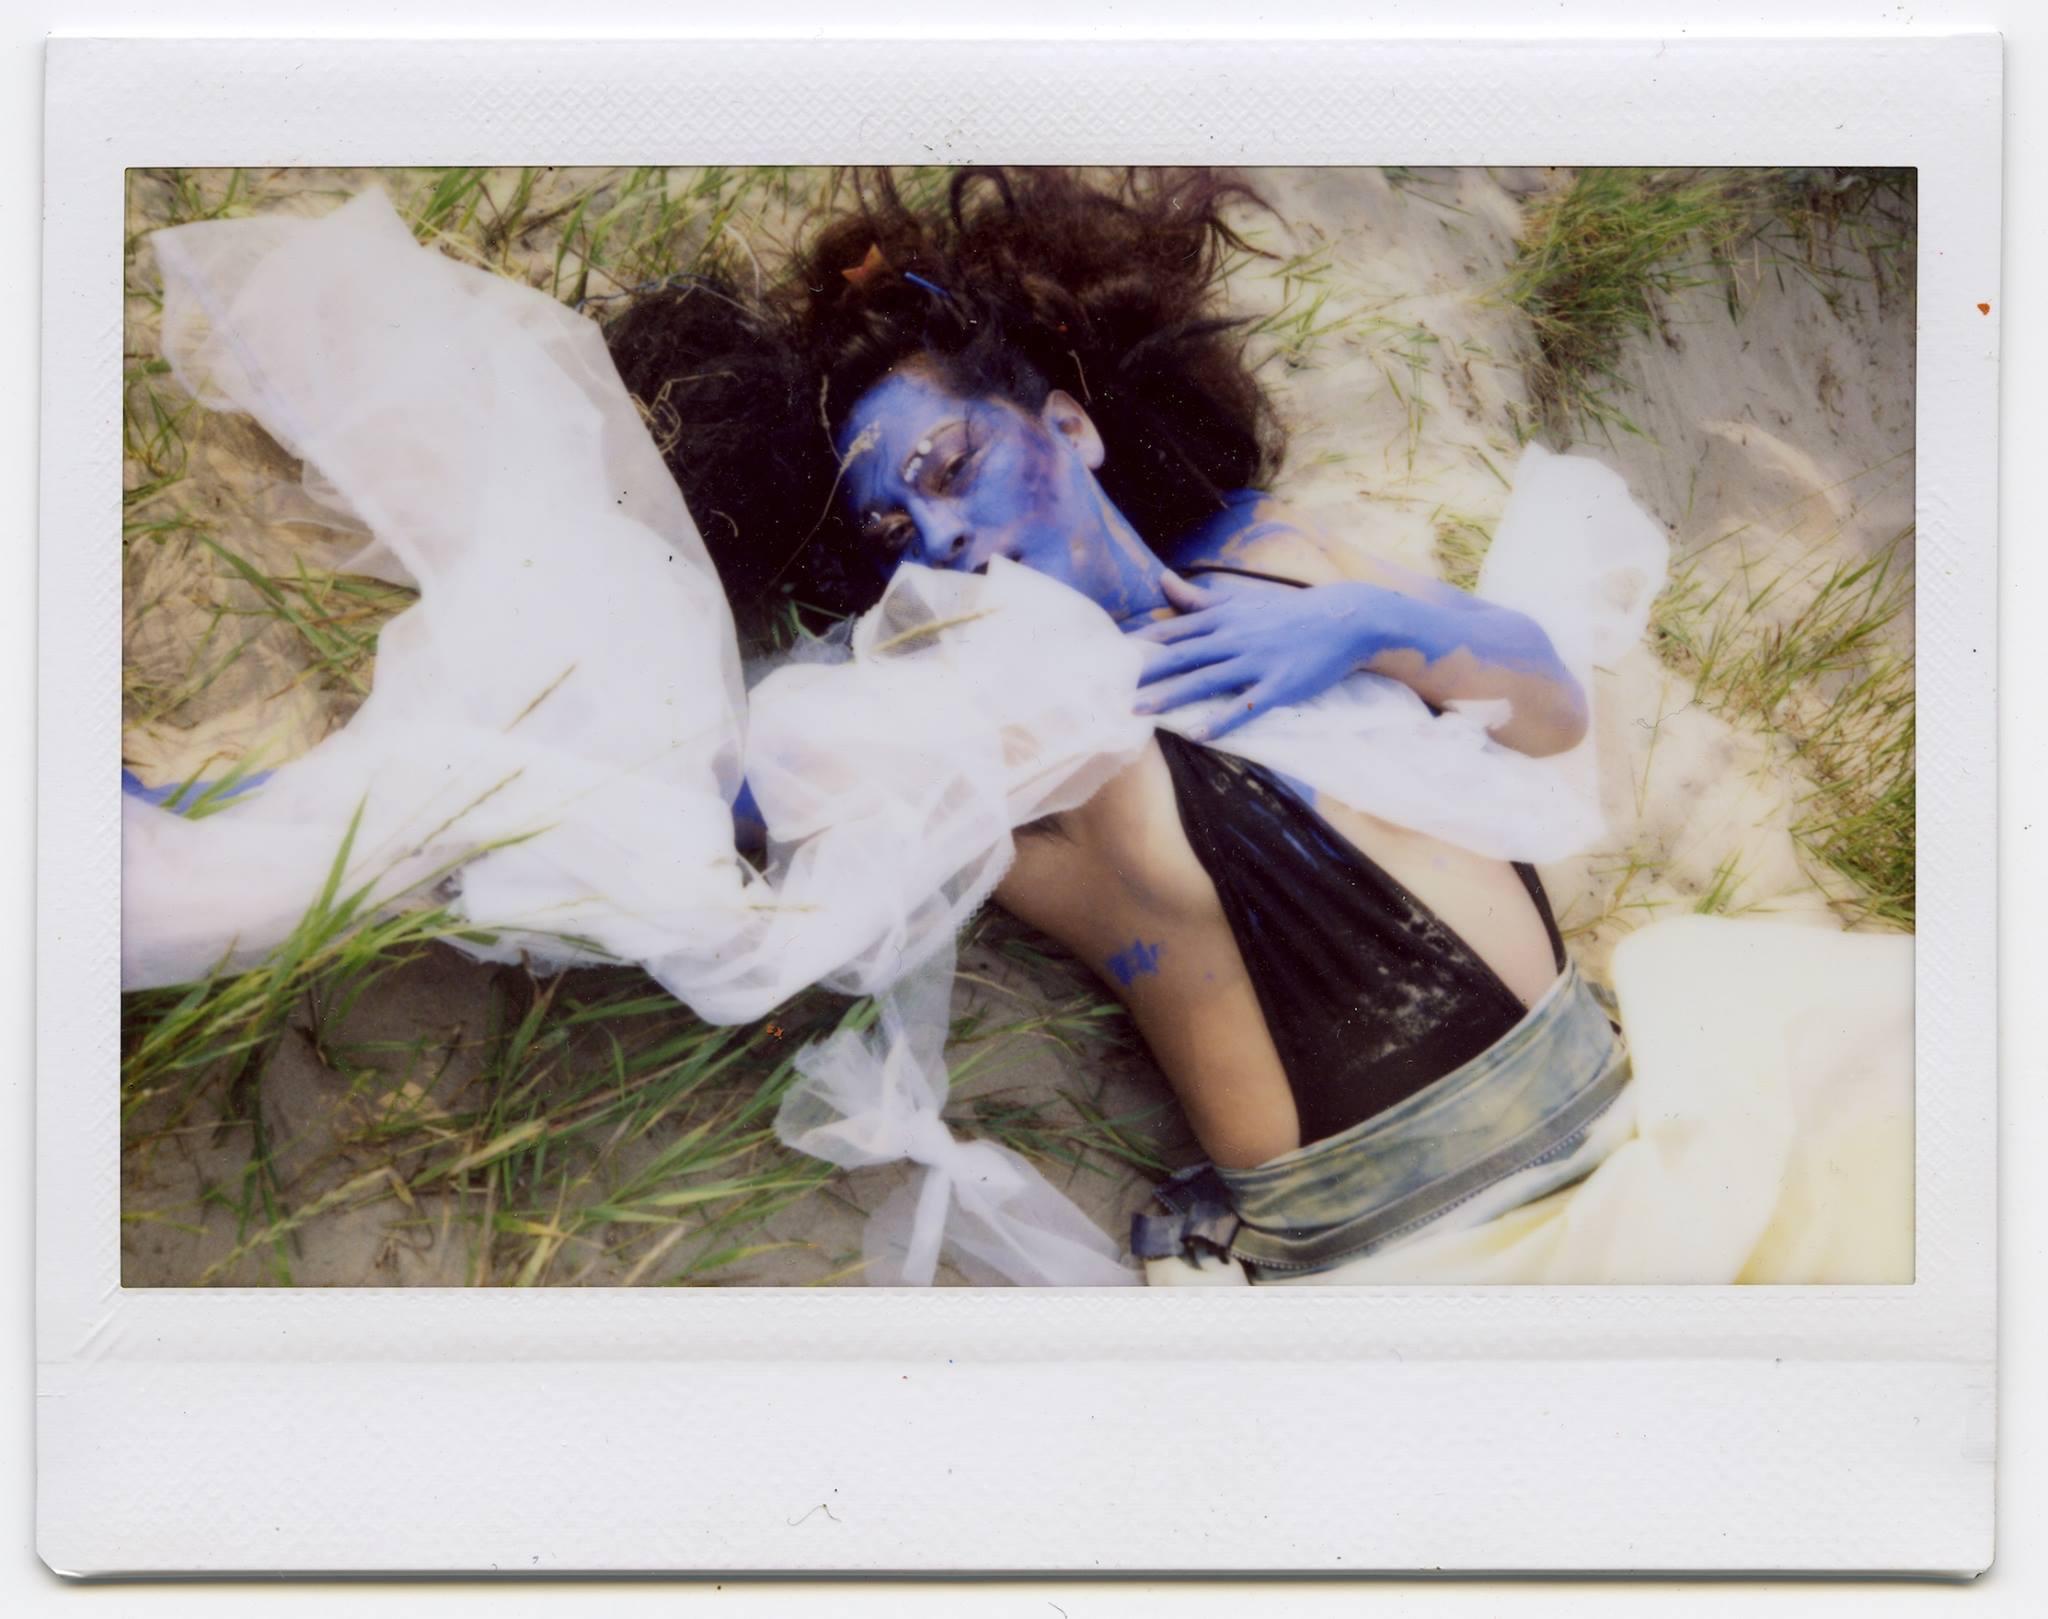 Sofia Moreno. Photo: Armando Lozano